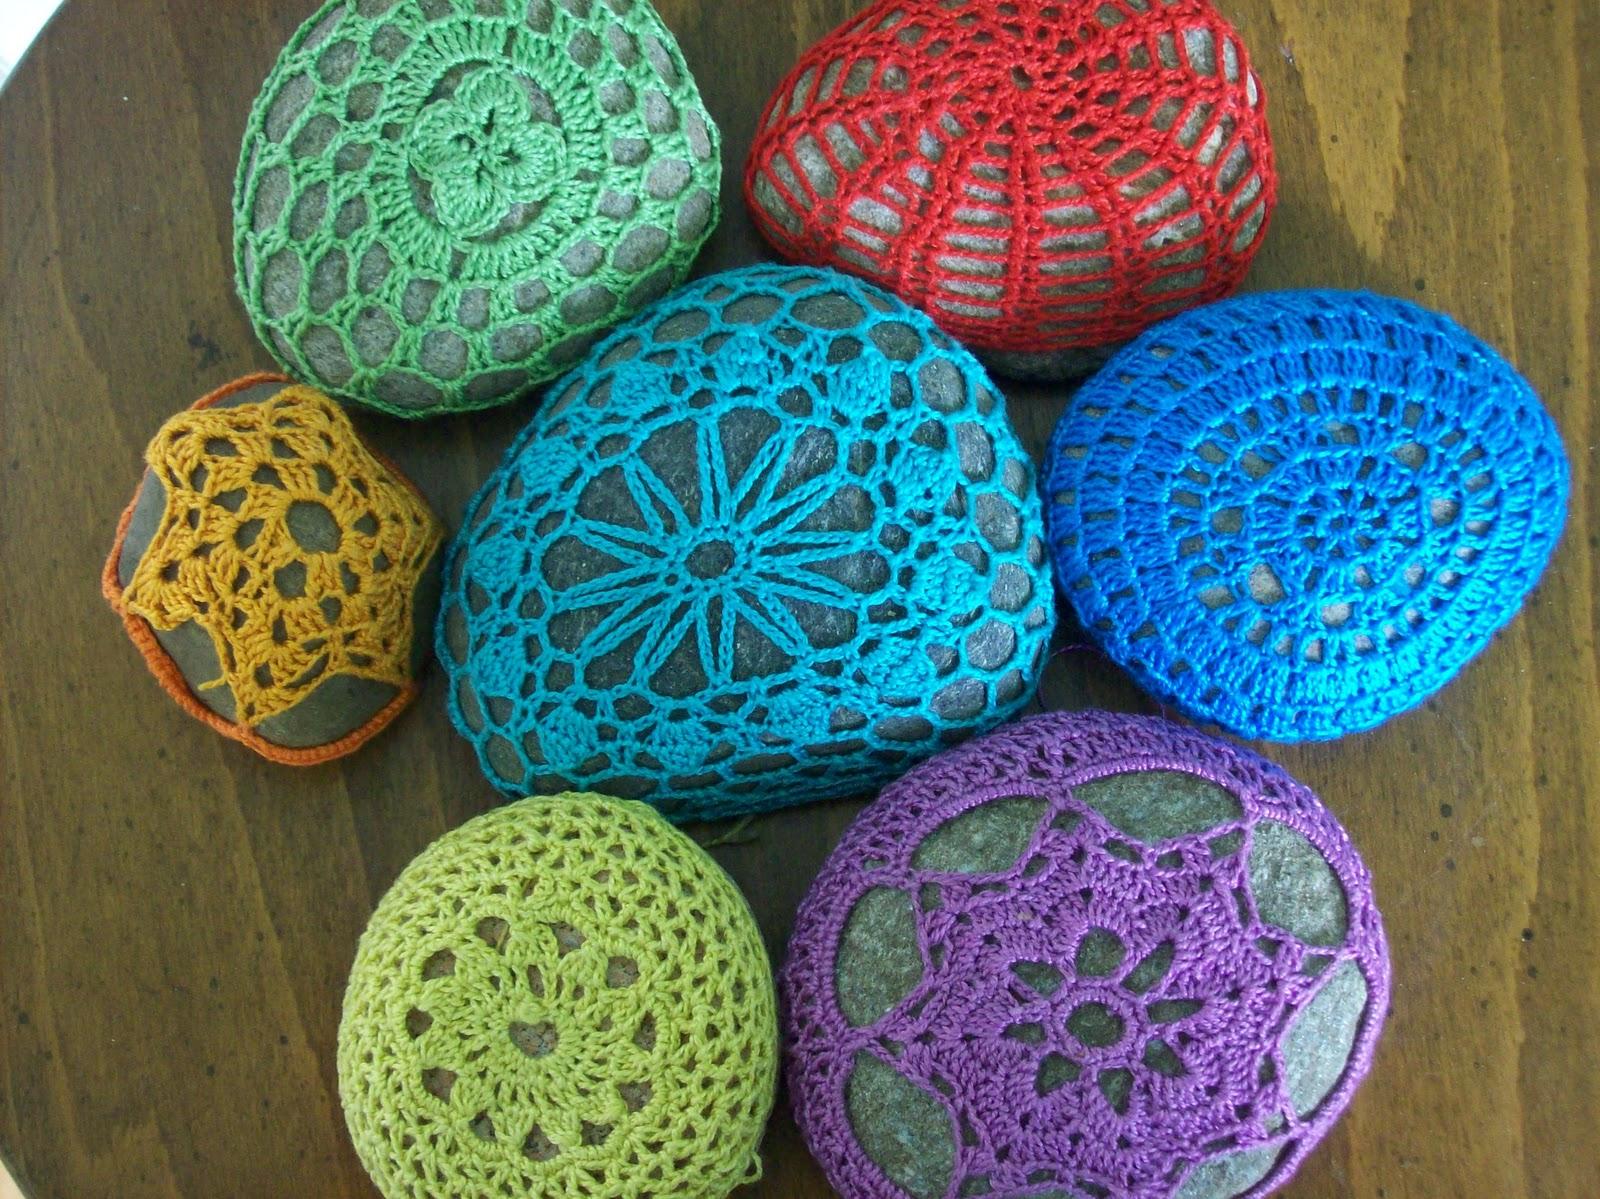 Crochet Home Magazine : Crochet Home Magazine - Crochet Club